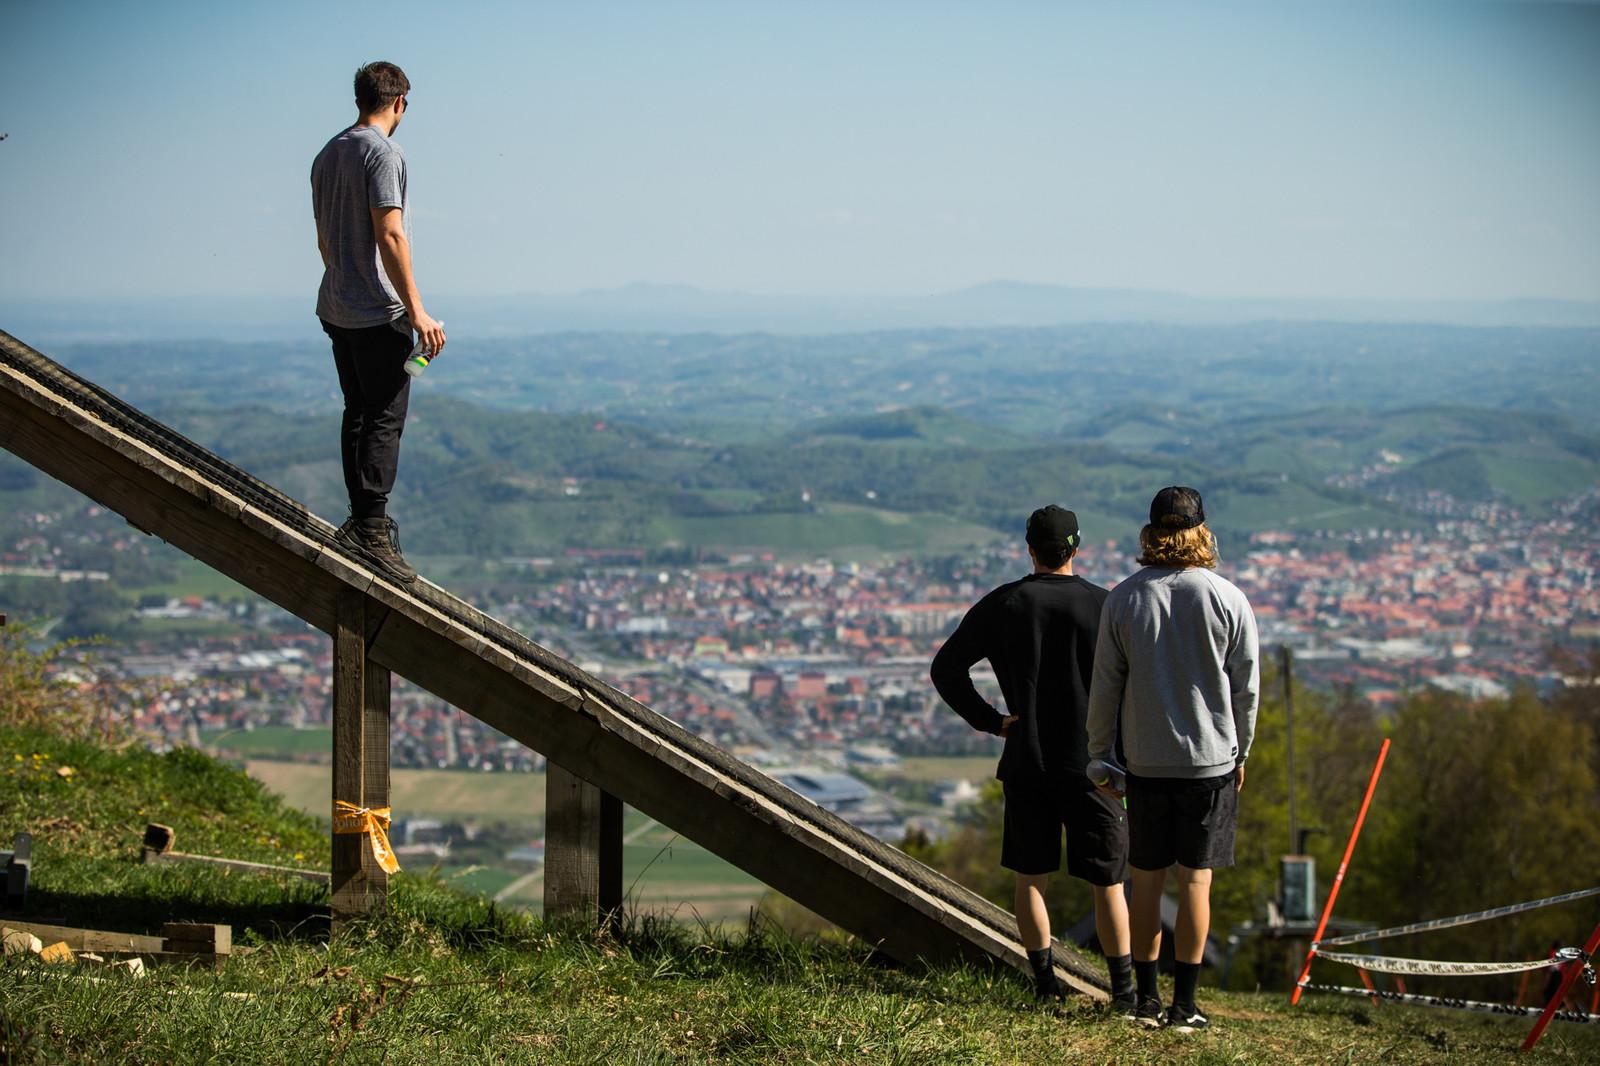 Track Walk - iXS Downhill Cup Maribor - Race Gallery - Mountain Biking Pictures - Vital MTB